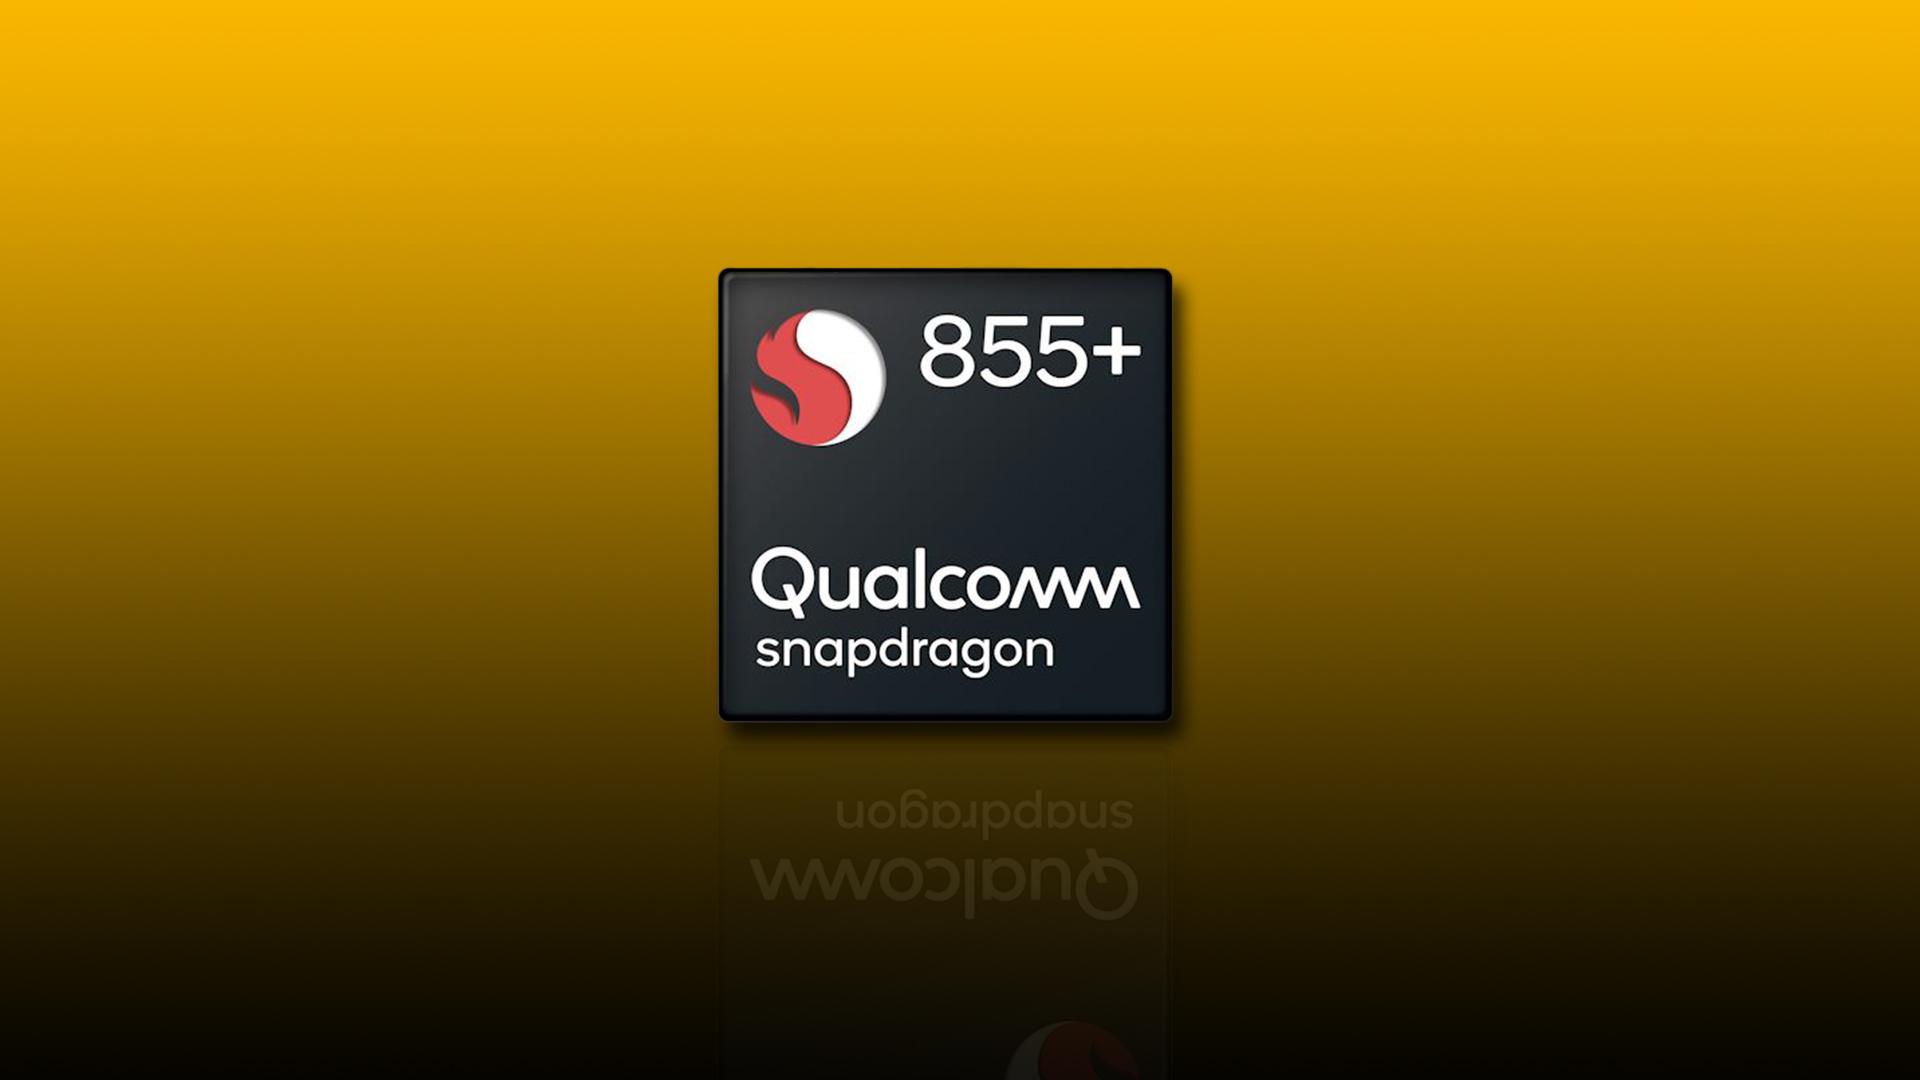 Qualcomm Announces Snapdragon 855 Plus